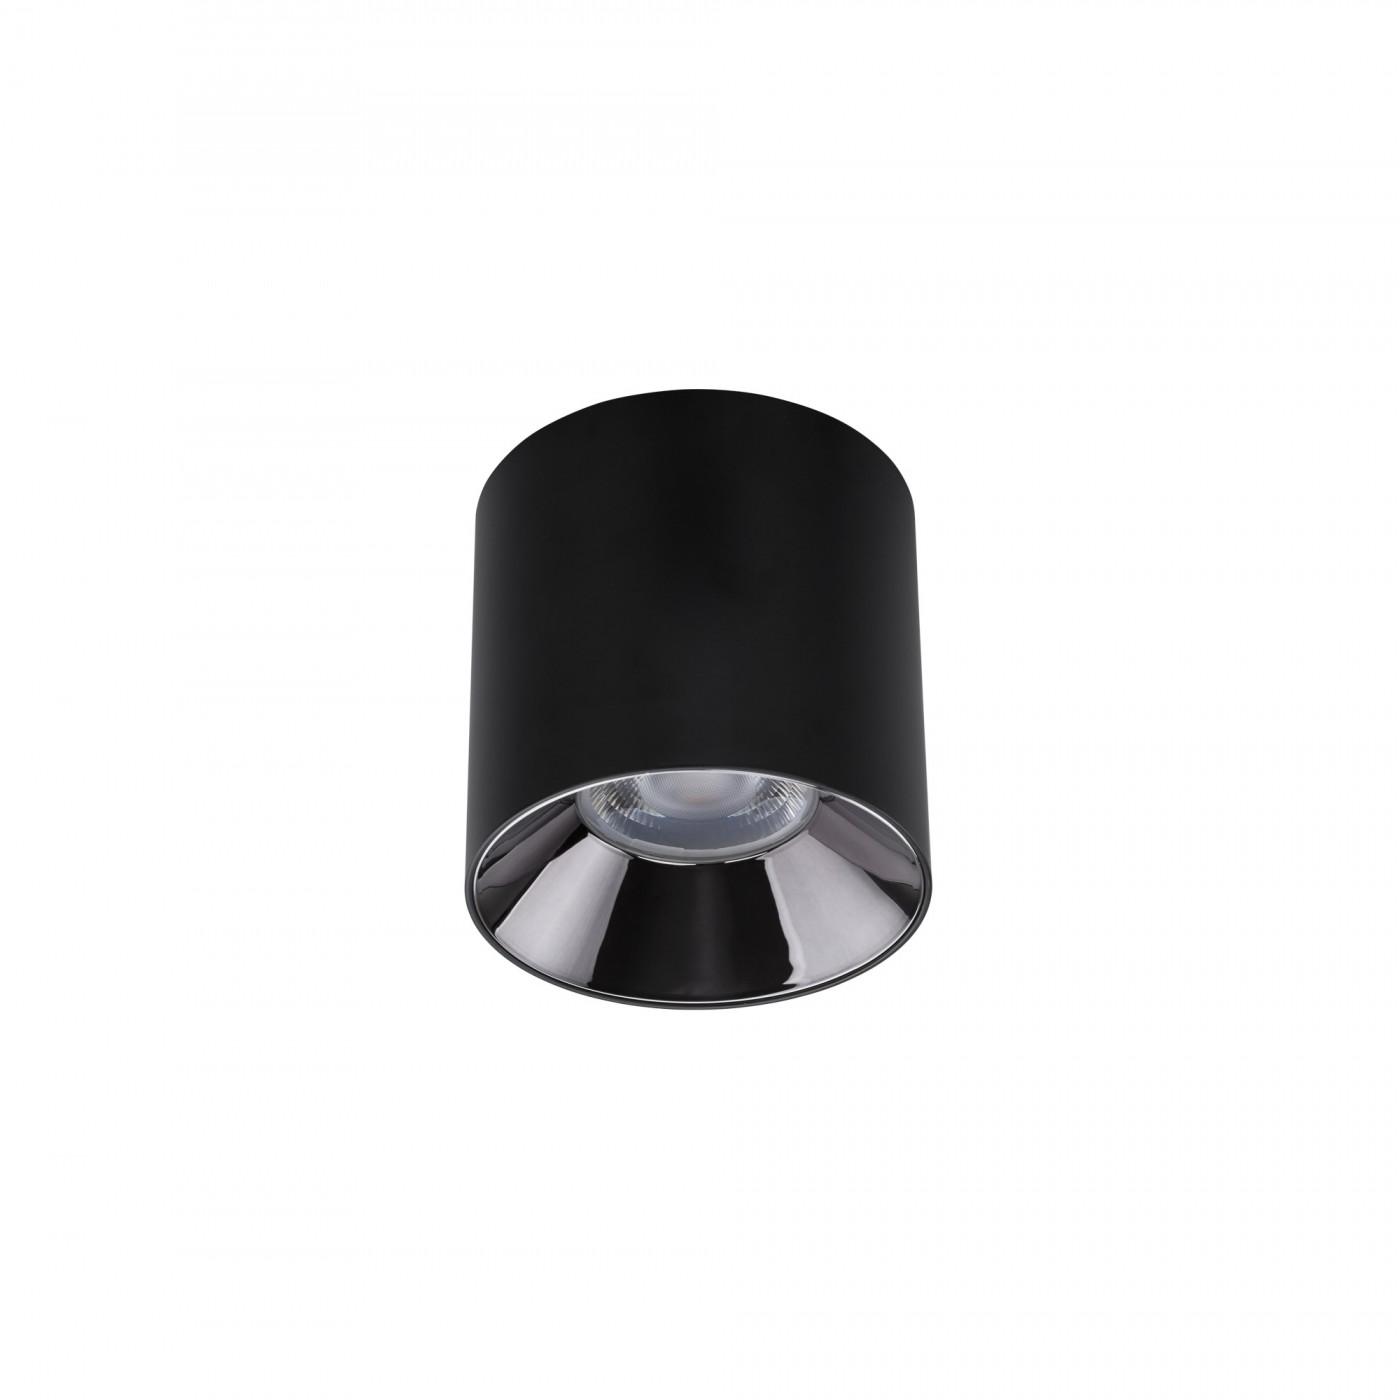 CL IOS LED 30W 3000K black 8733 Nowodvorski Lighting